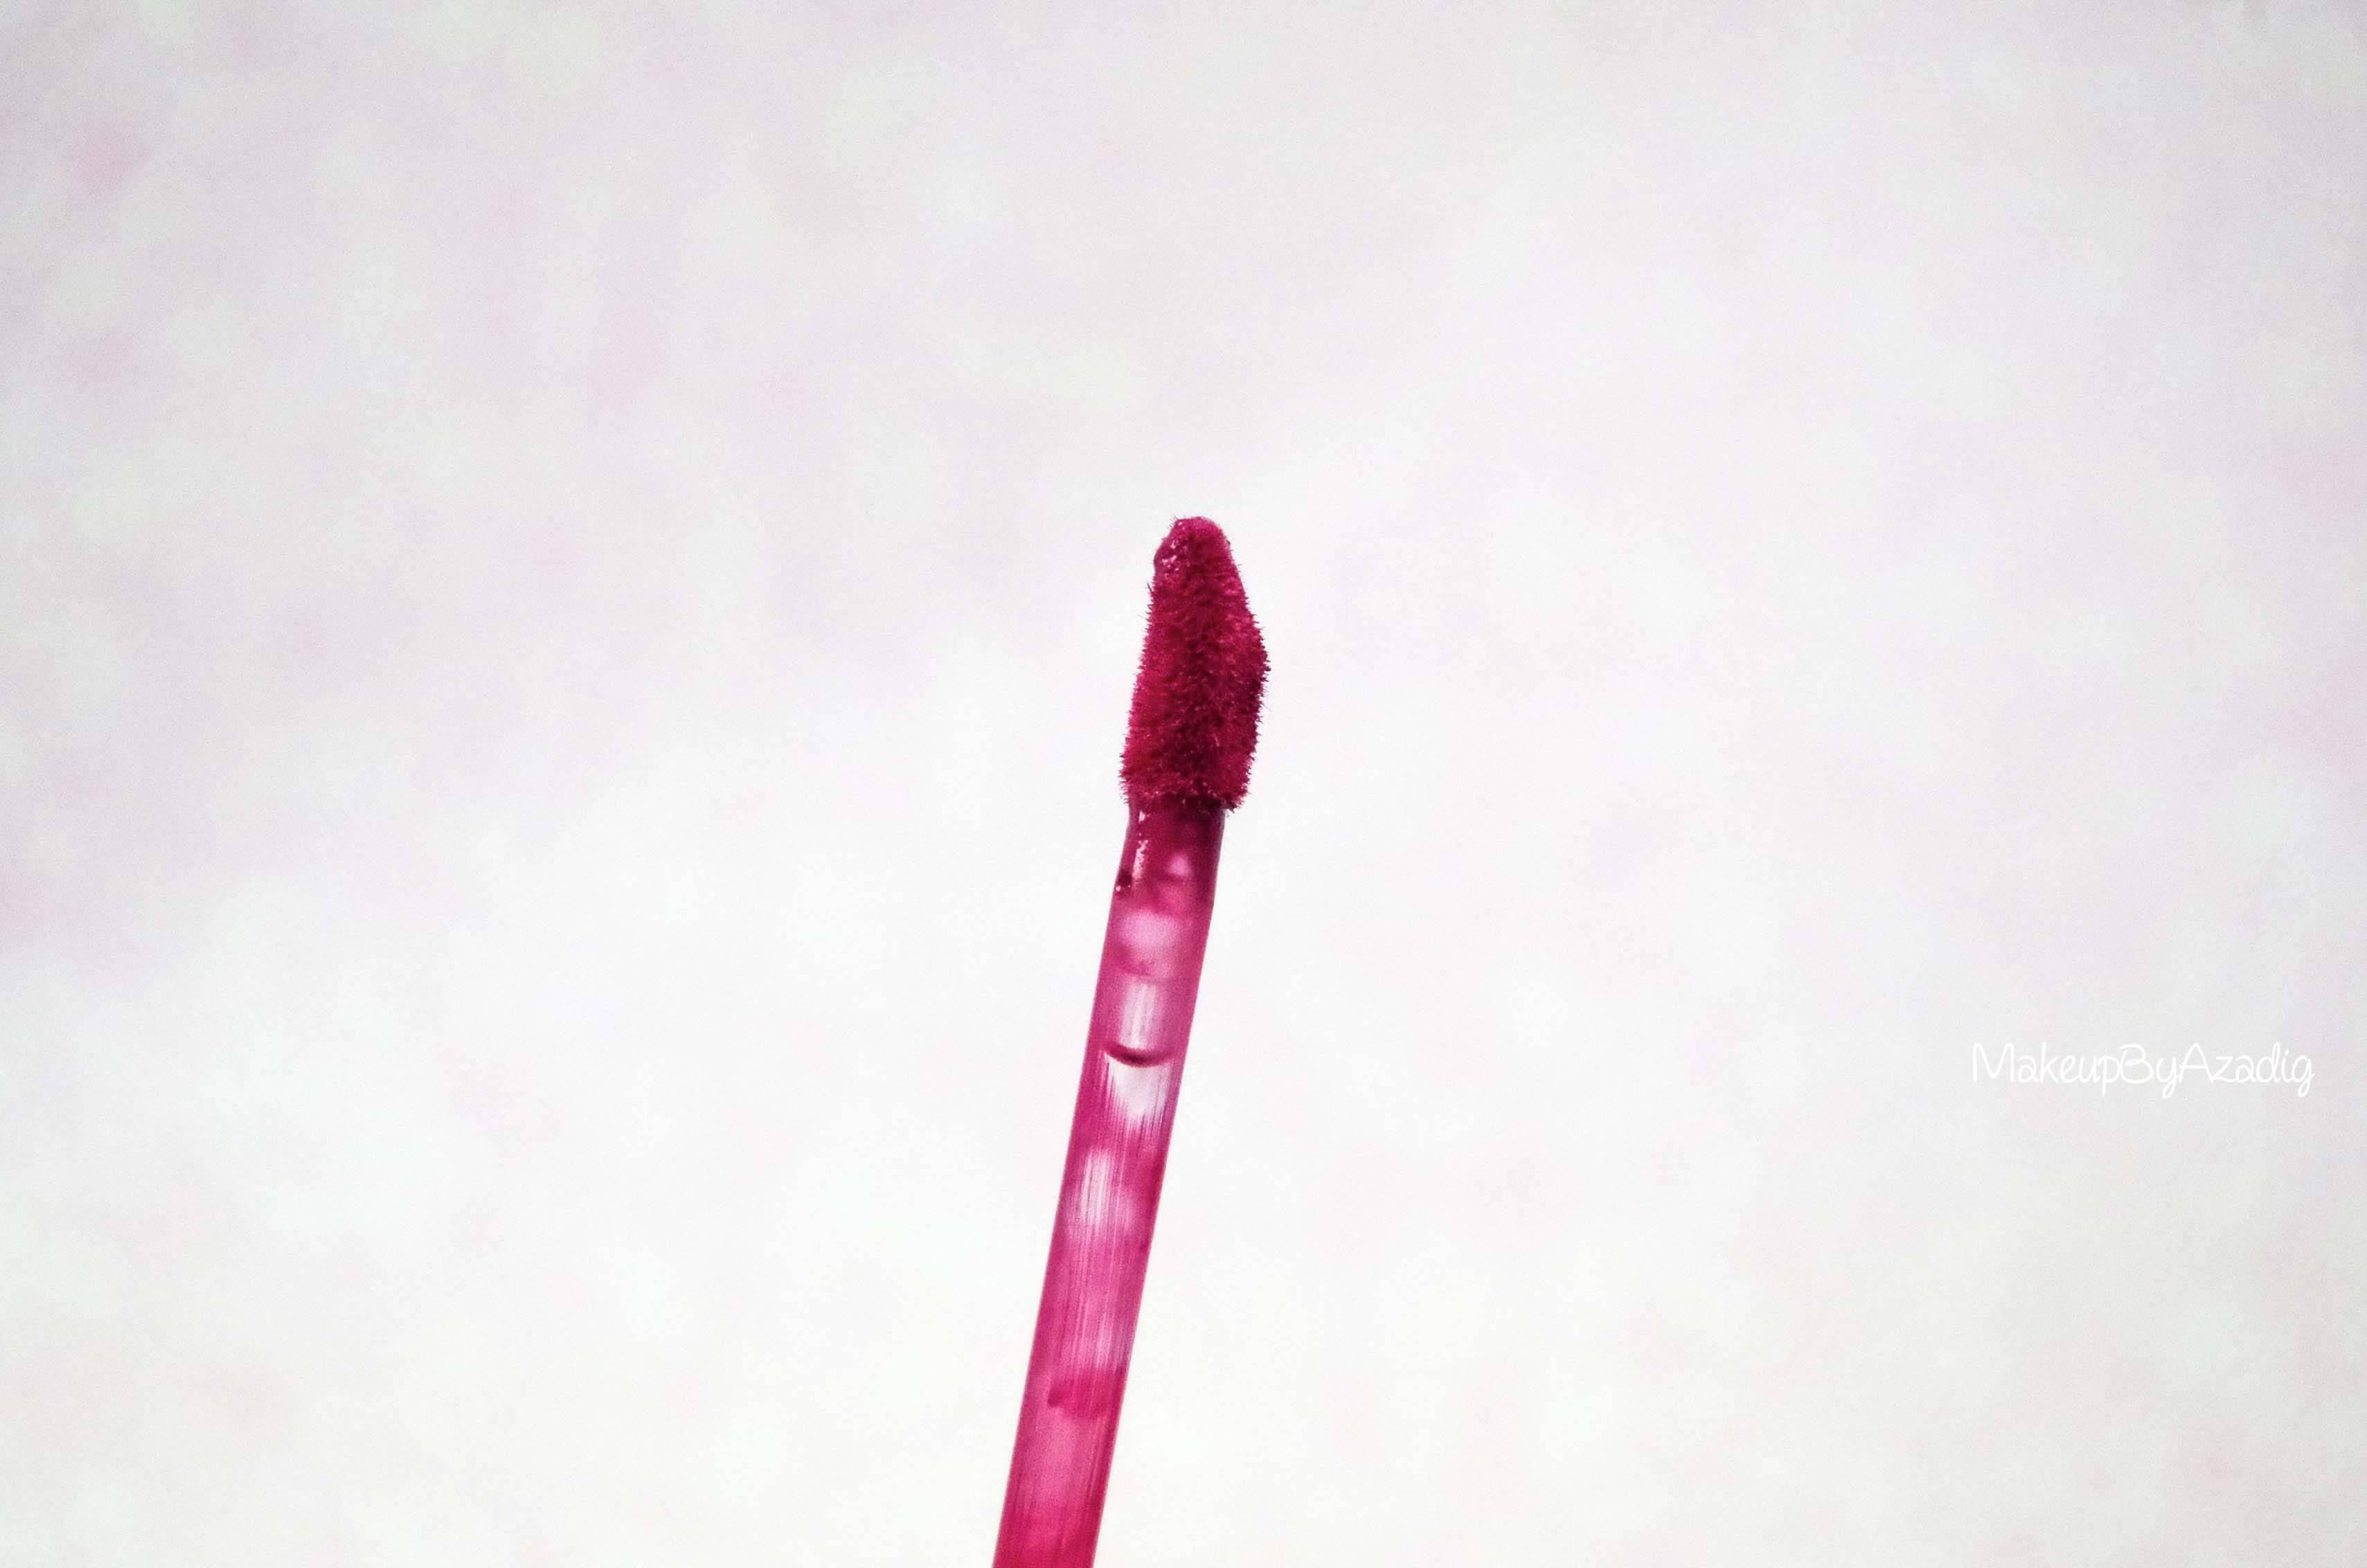 makeupbyazadig-melted-matte-queenb-bendandsnap-influencer-too-faced-rouge-levres-revue-avis-prix-sephora-paris-blog-liquide-embout